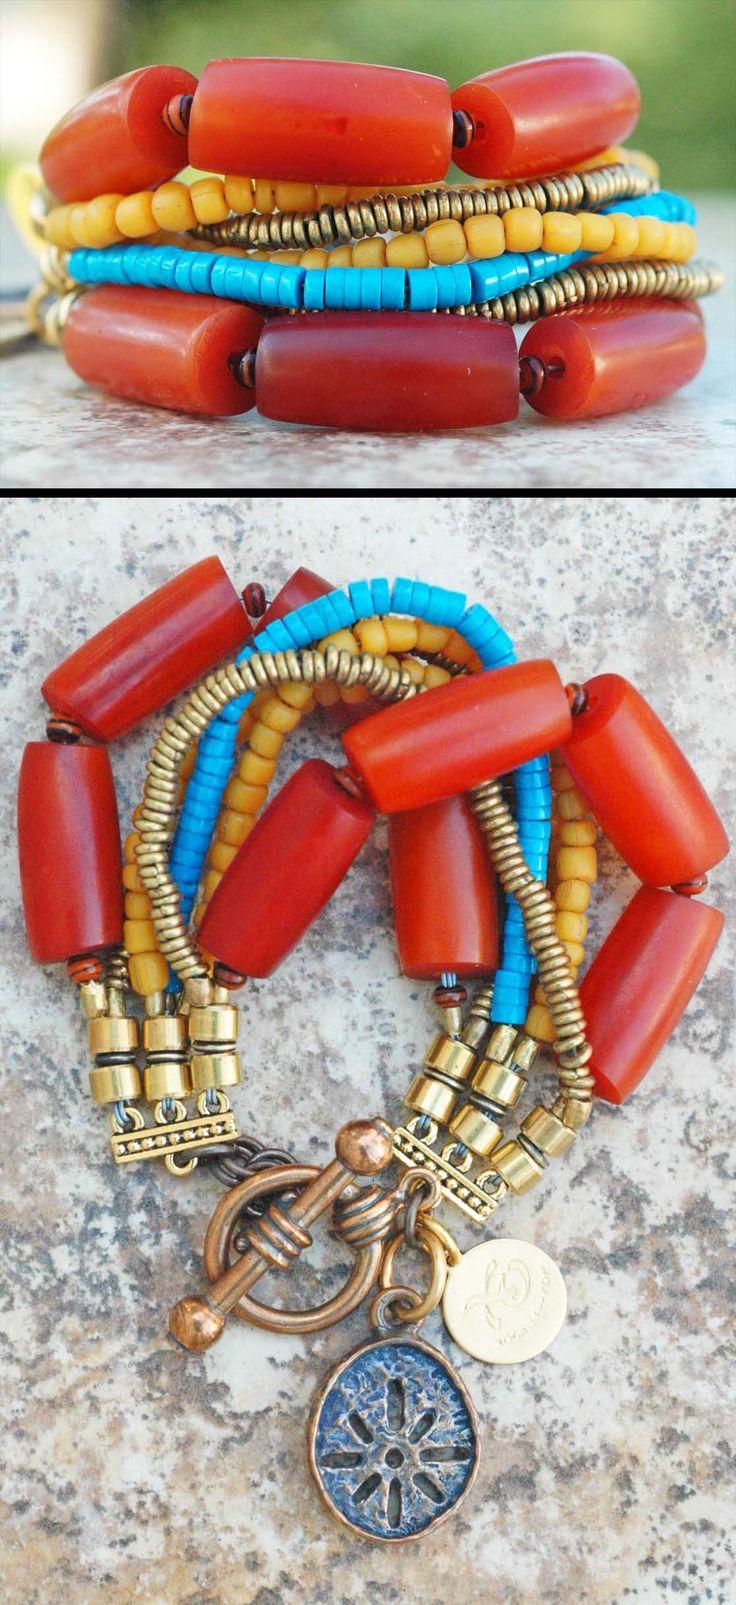 Bali Bracelet: Amber Resin, Turquoise, Yellow, Brass and Bronze Sun Charm Bracelet $150